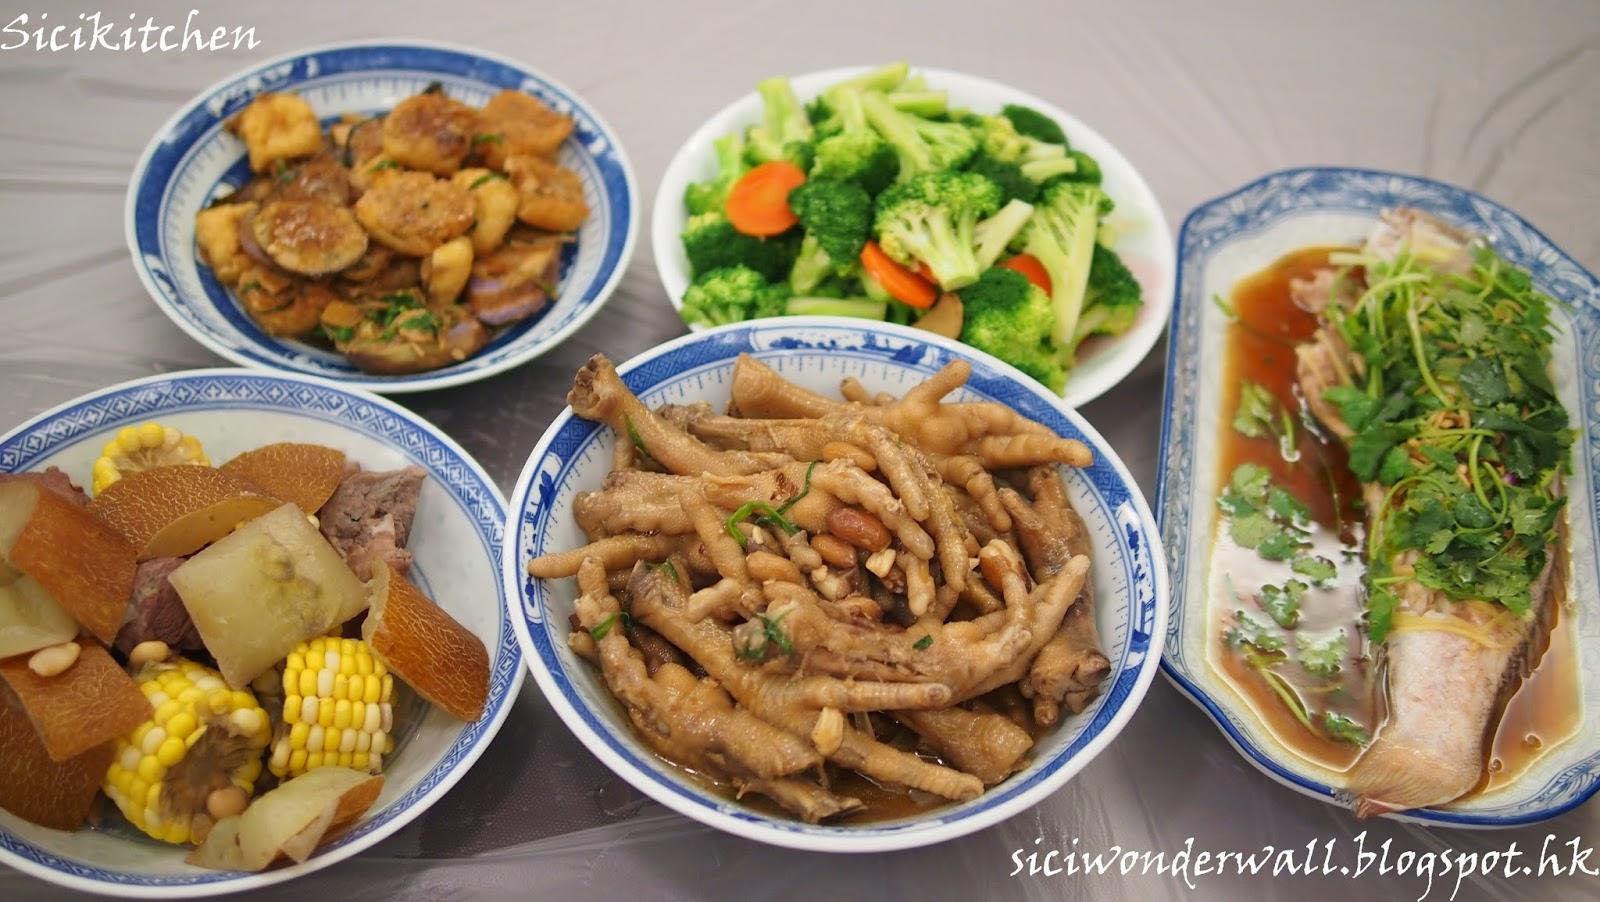 Sicikitchen: 【去濕湯水】老黃瓜粟米赤小豆煲豬骨湯水-附食譜